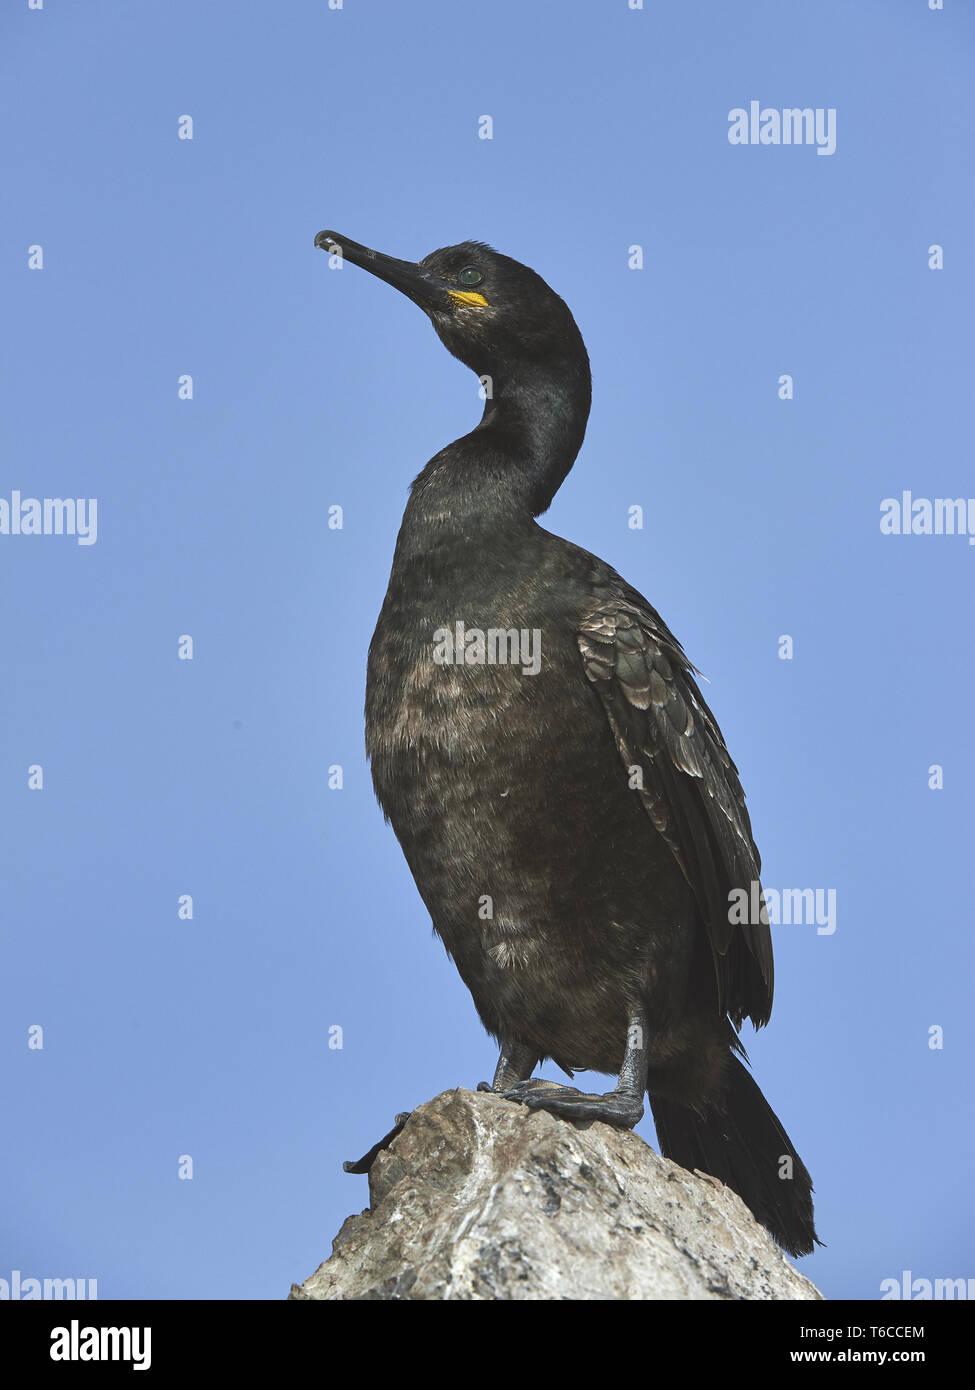 European shag, common shag, Phalacrocorax aristotelis - Stock Image